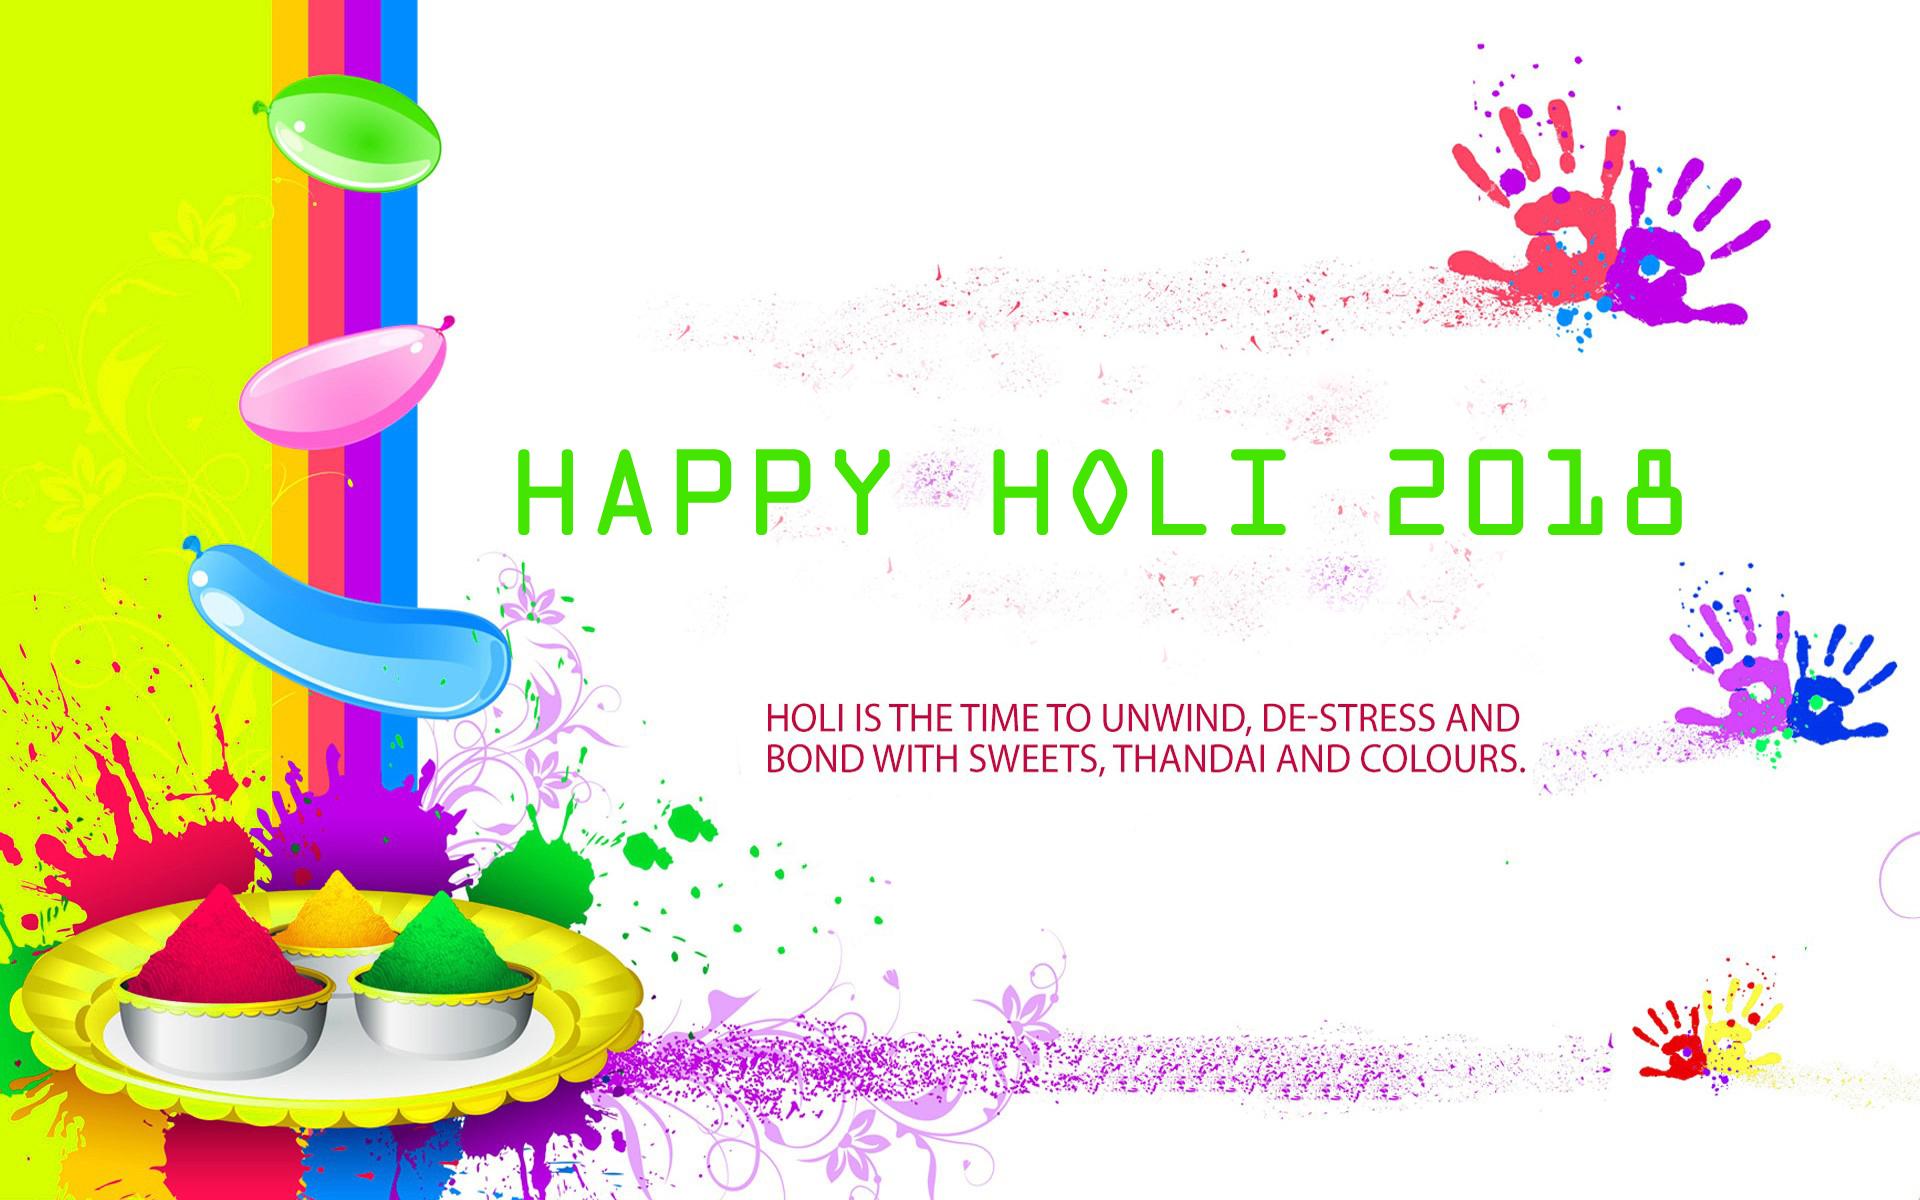 Happy Holi 2018 Wallpaper In High Resolution